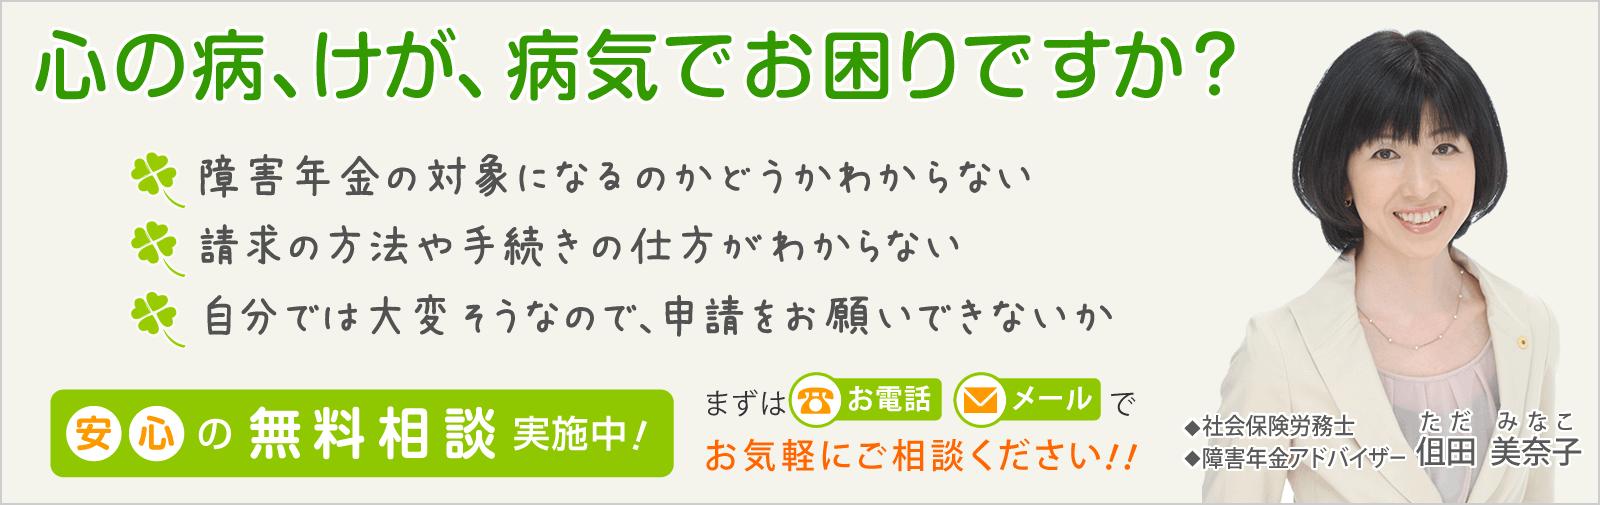 障害年金の申請受給サポート|東京都無料相談